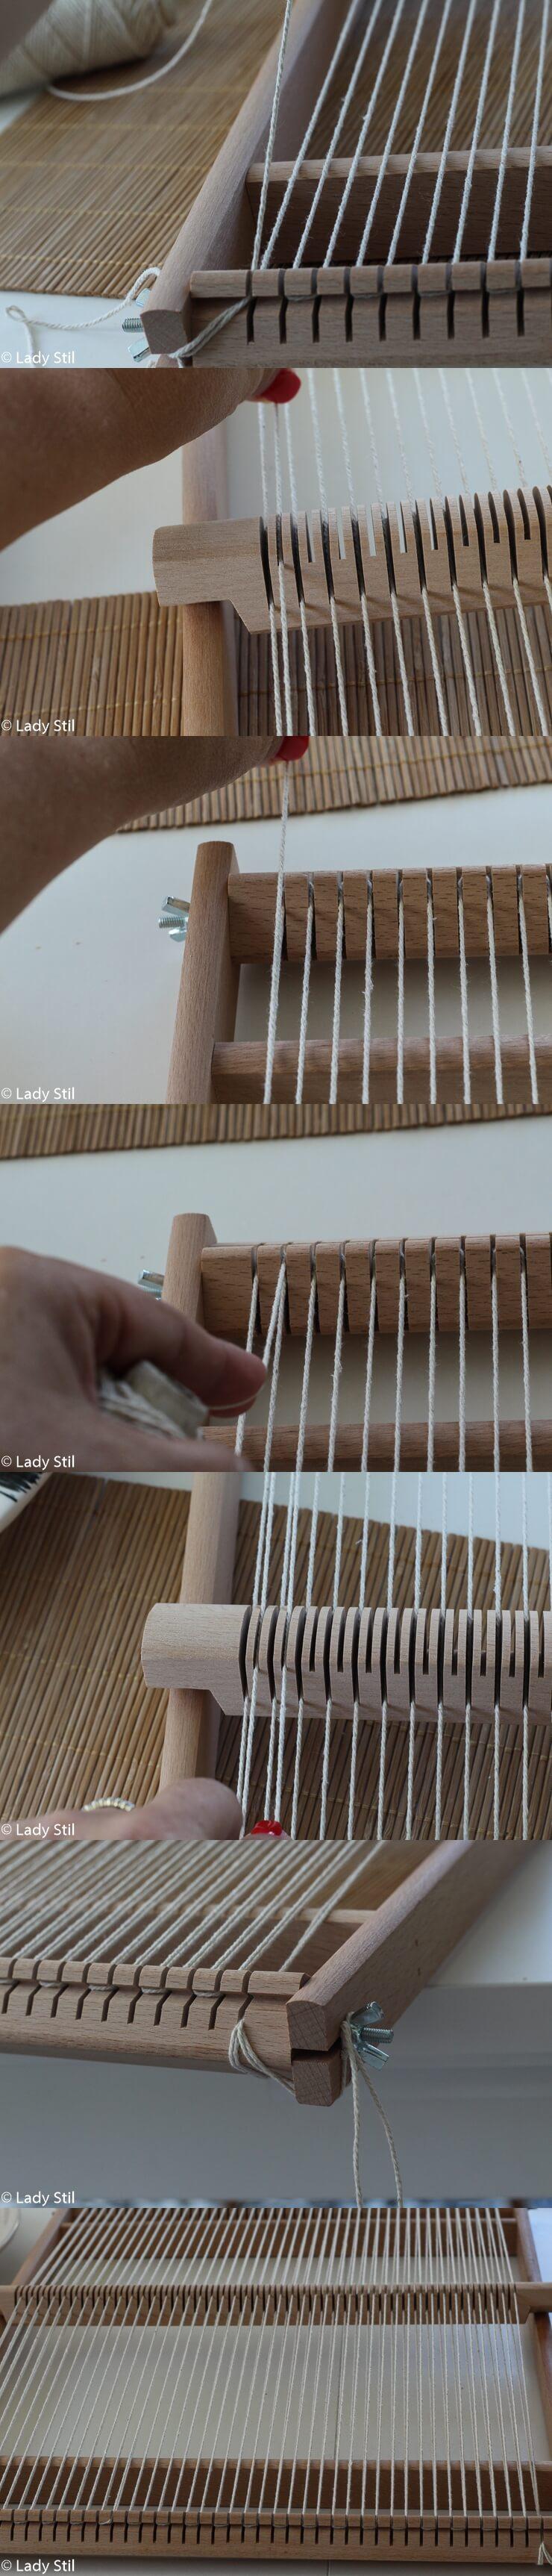 Wandteppich weben Kettfäden einlegen Anleitung